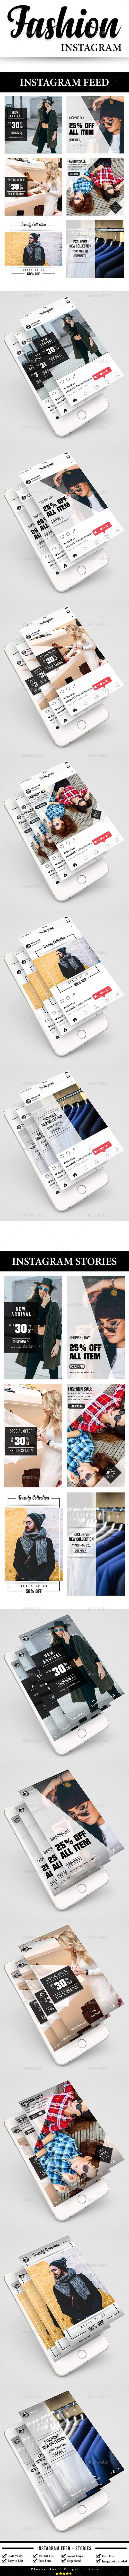 Fashion Instagram (Feed + Stories) - Social Media Web Elements